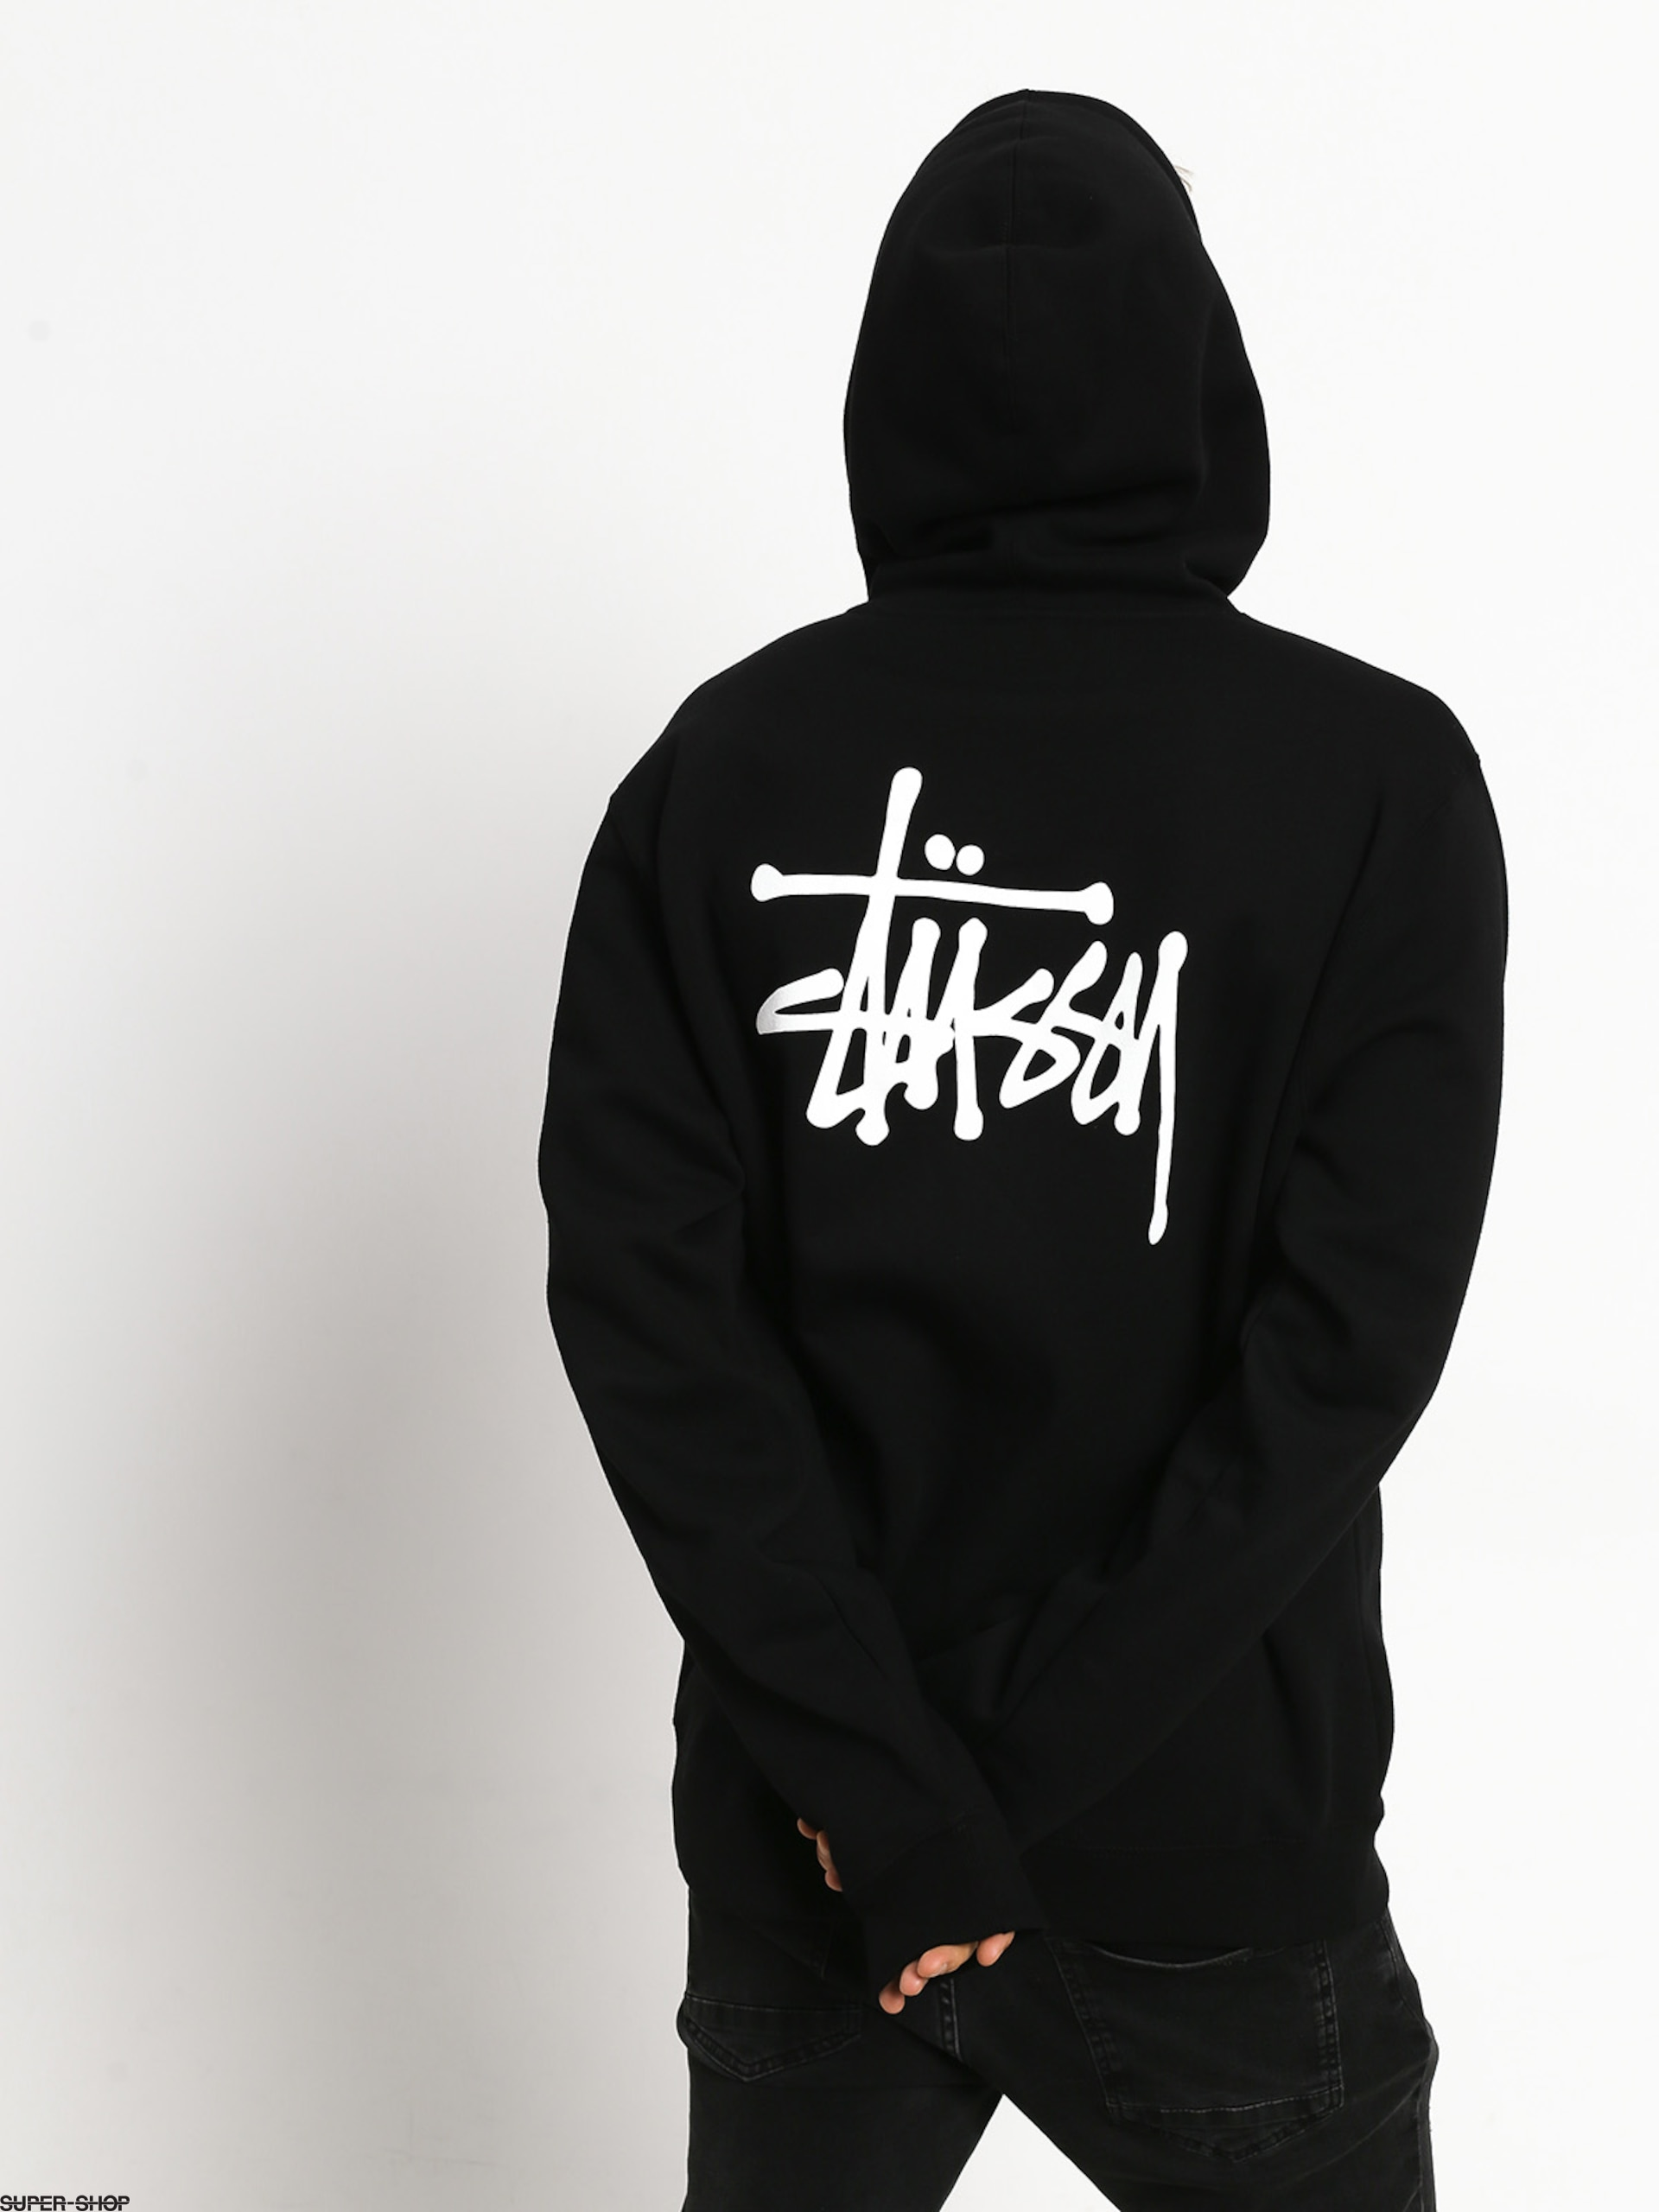 8a7219840 1023150-w1920-stussy-basic-hd-hoodie-black.jpg